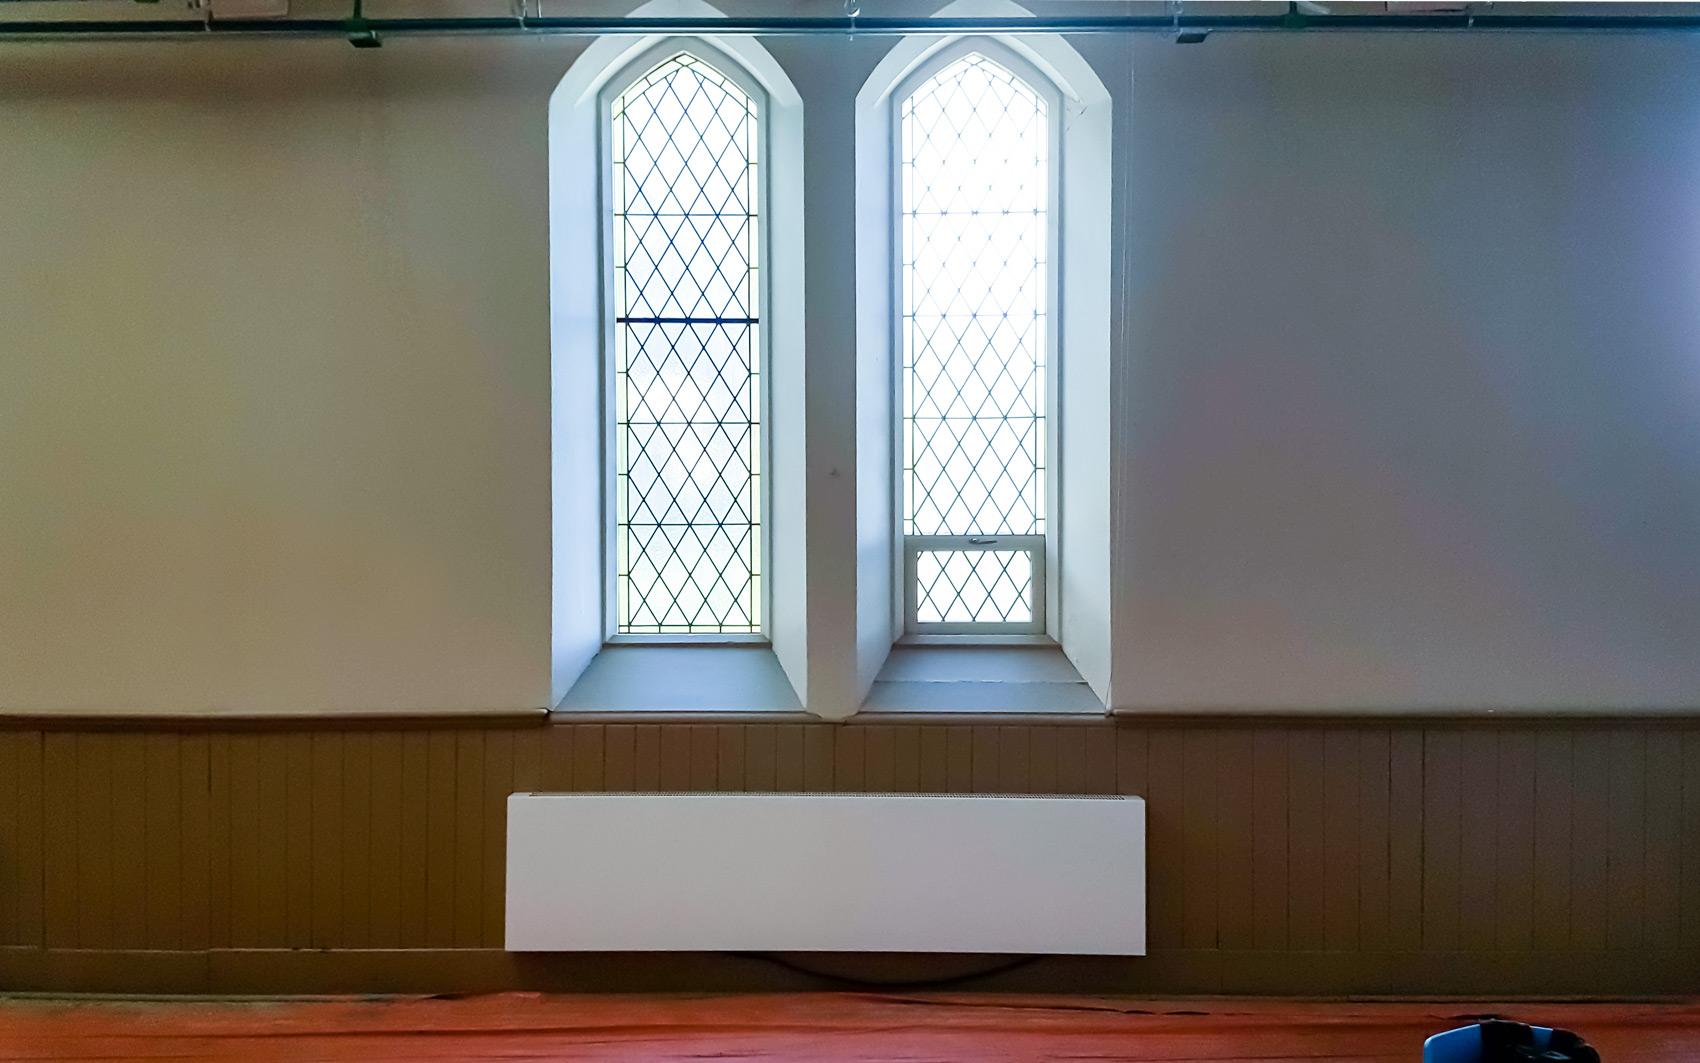 Full Size of Wandheizkörper Wandheizkrper In Der Kirche St George Guelph Kanada Wohnzimmer Wandheizkörper